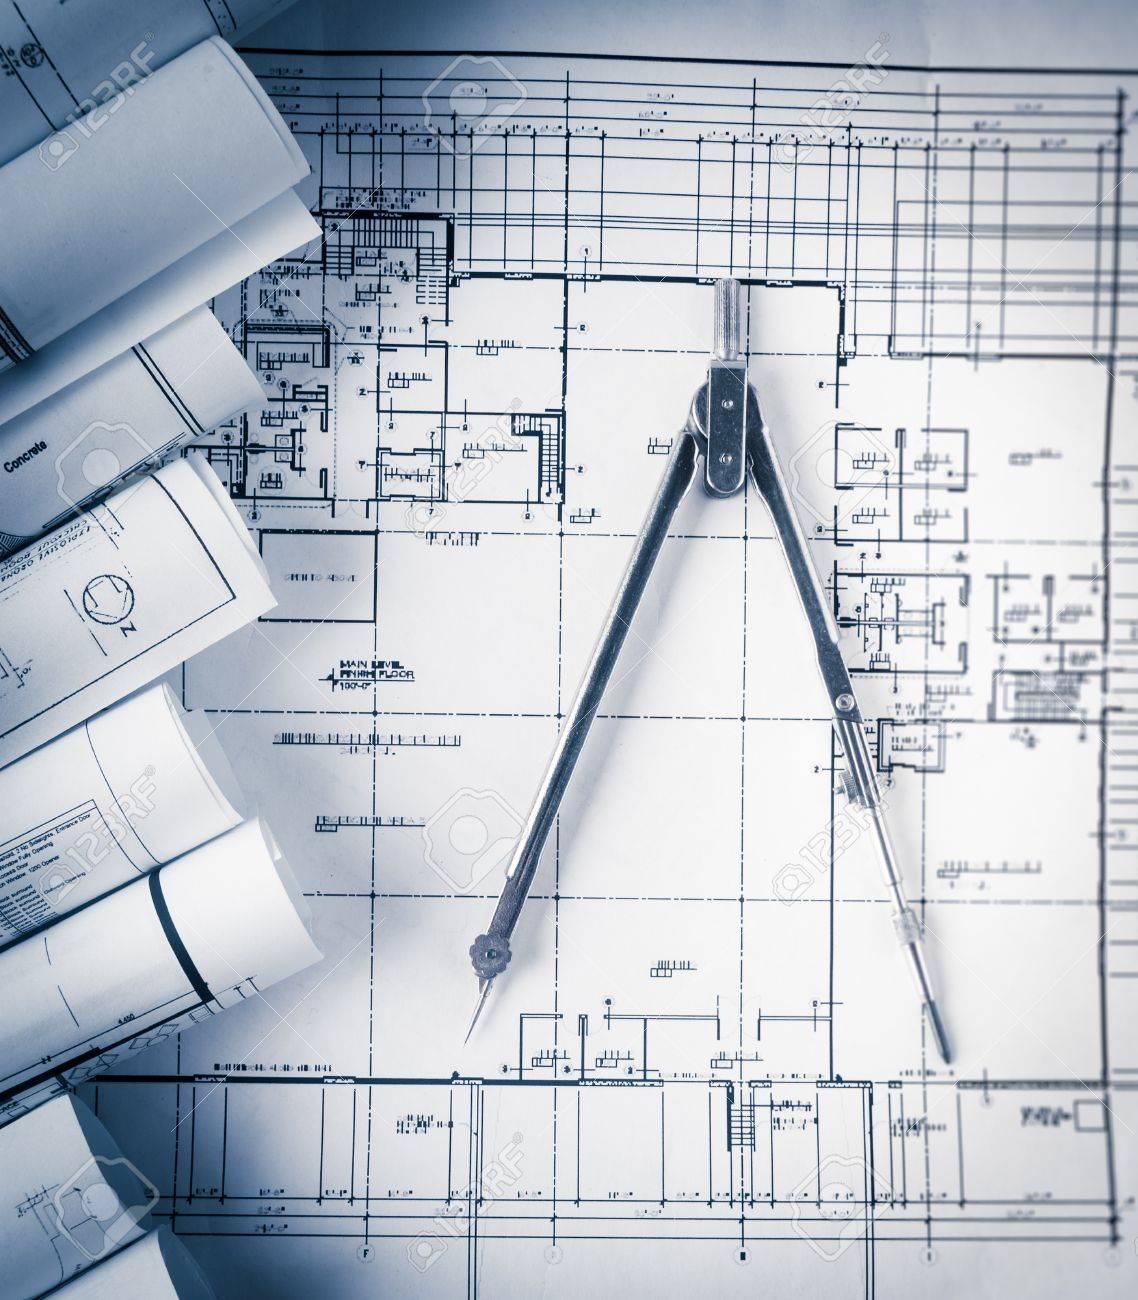 Blueprint house plan architecture royalty vss pro rolls of architecture blueprints and house plans on the table 41611301 rolls of architecture blueprints and house plans on the table and drawing compass malvernweather Images